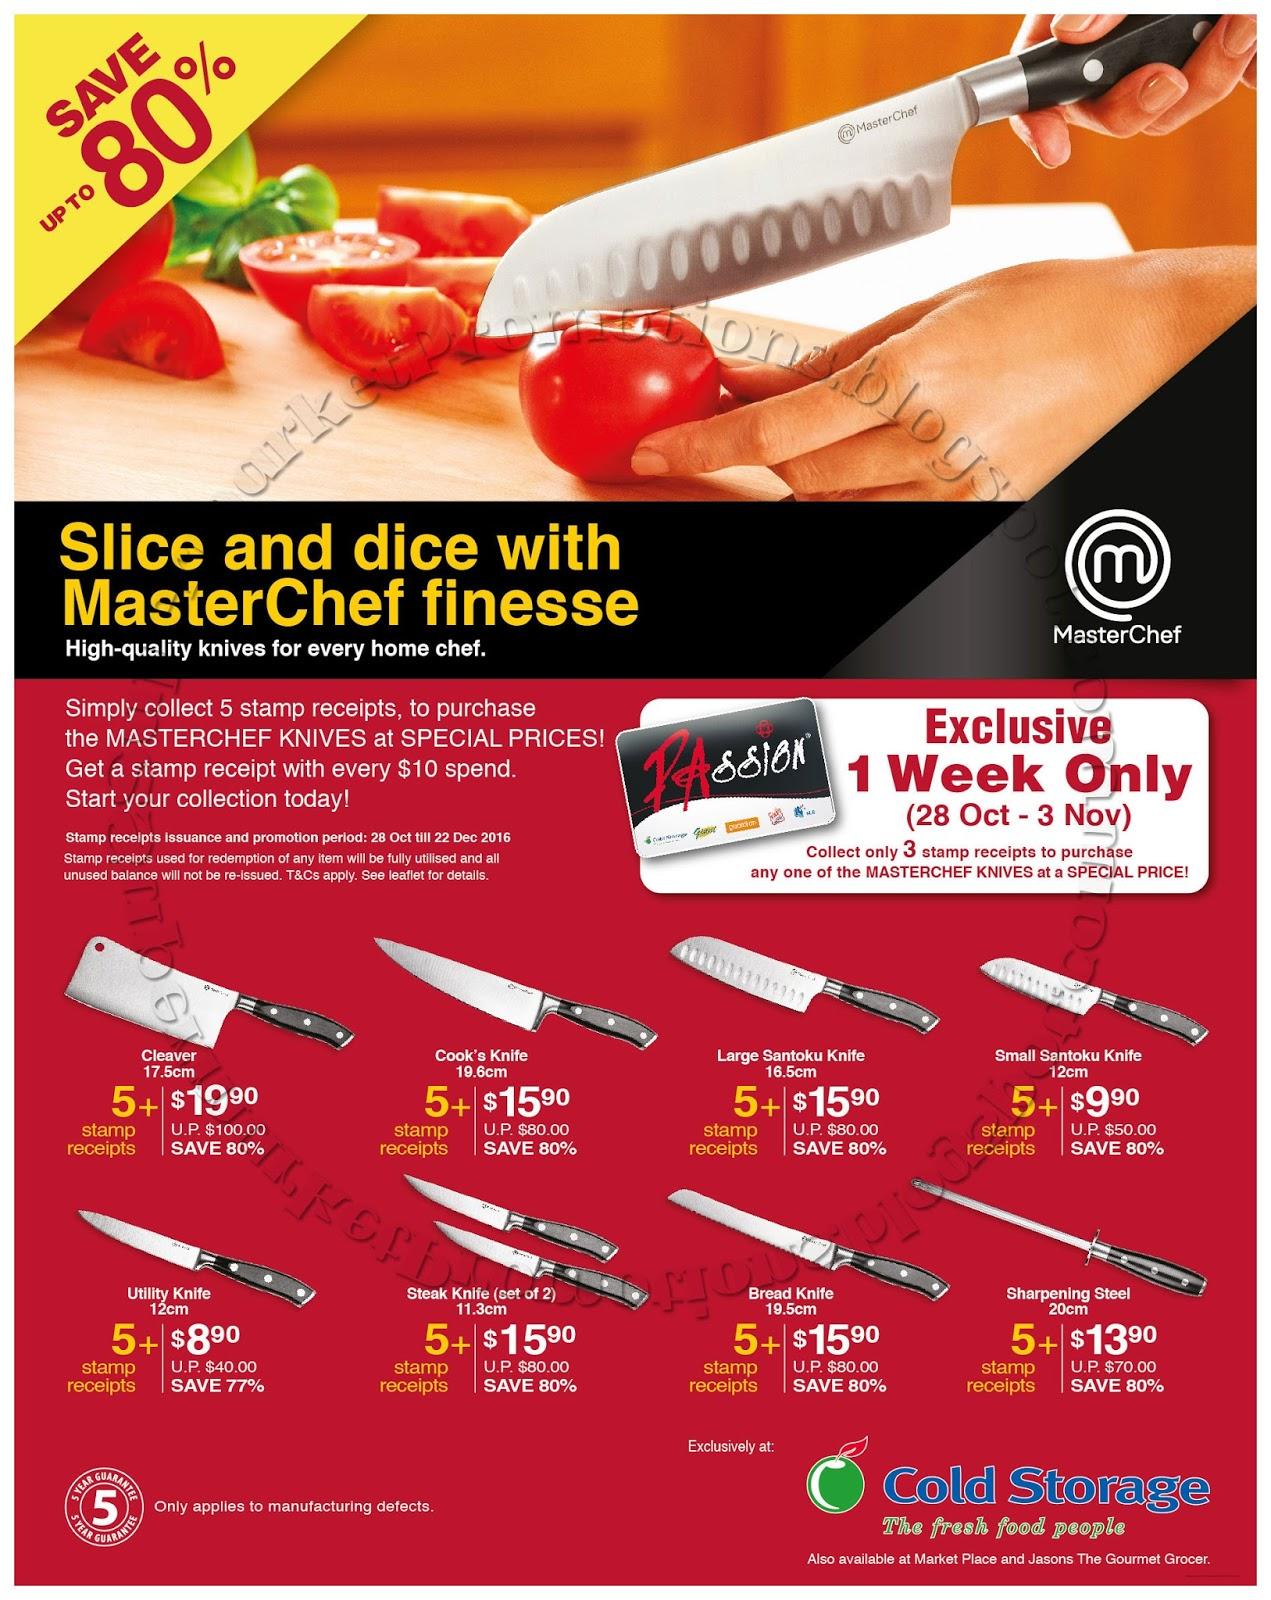 Cold Storage MasterChef Knives Special 28 October - 03 November 2016  sc 1 st  Supermarket Promotions & Cold Storage MasterChef Knives Special 28 October - 03 November 2016 ...